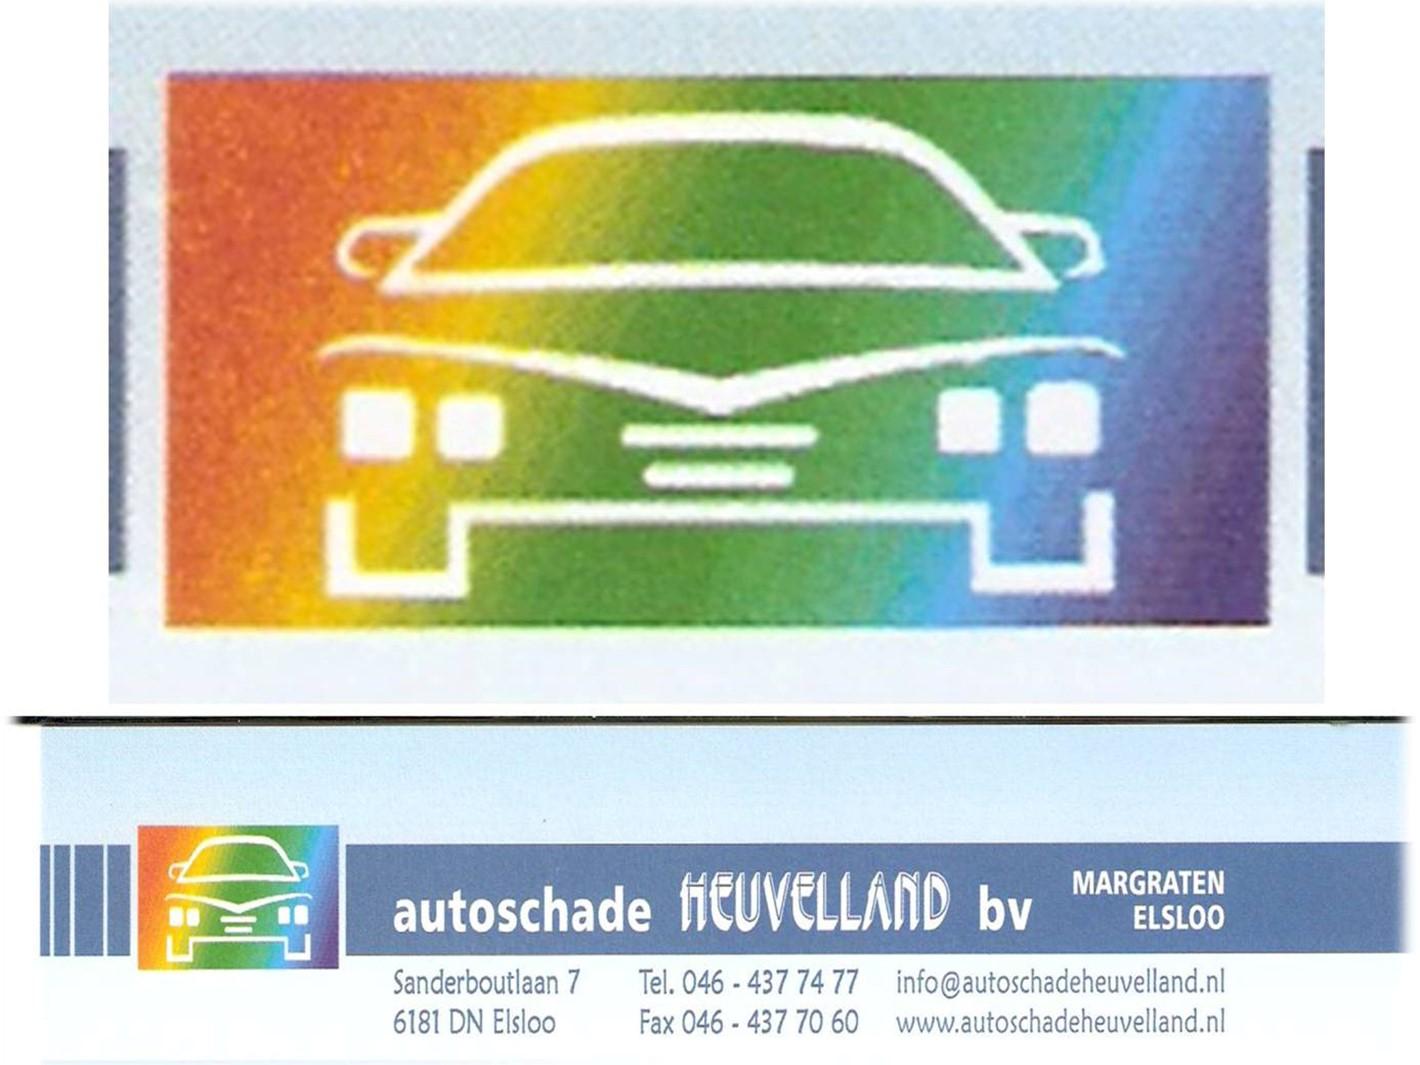 Autoschade Heuvelland Elsloo